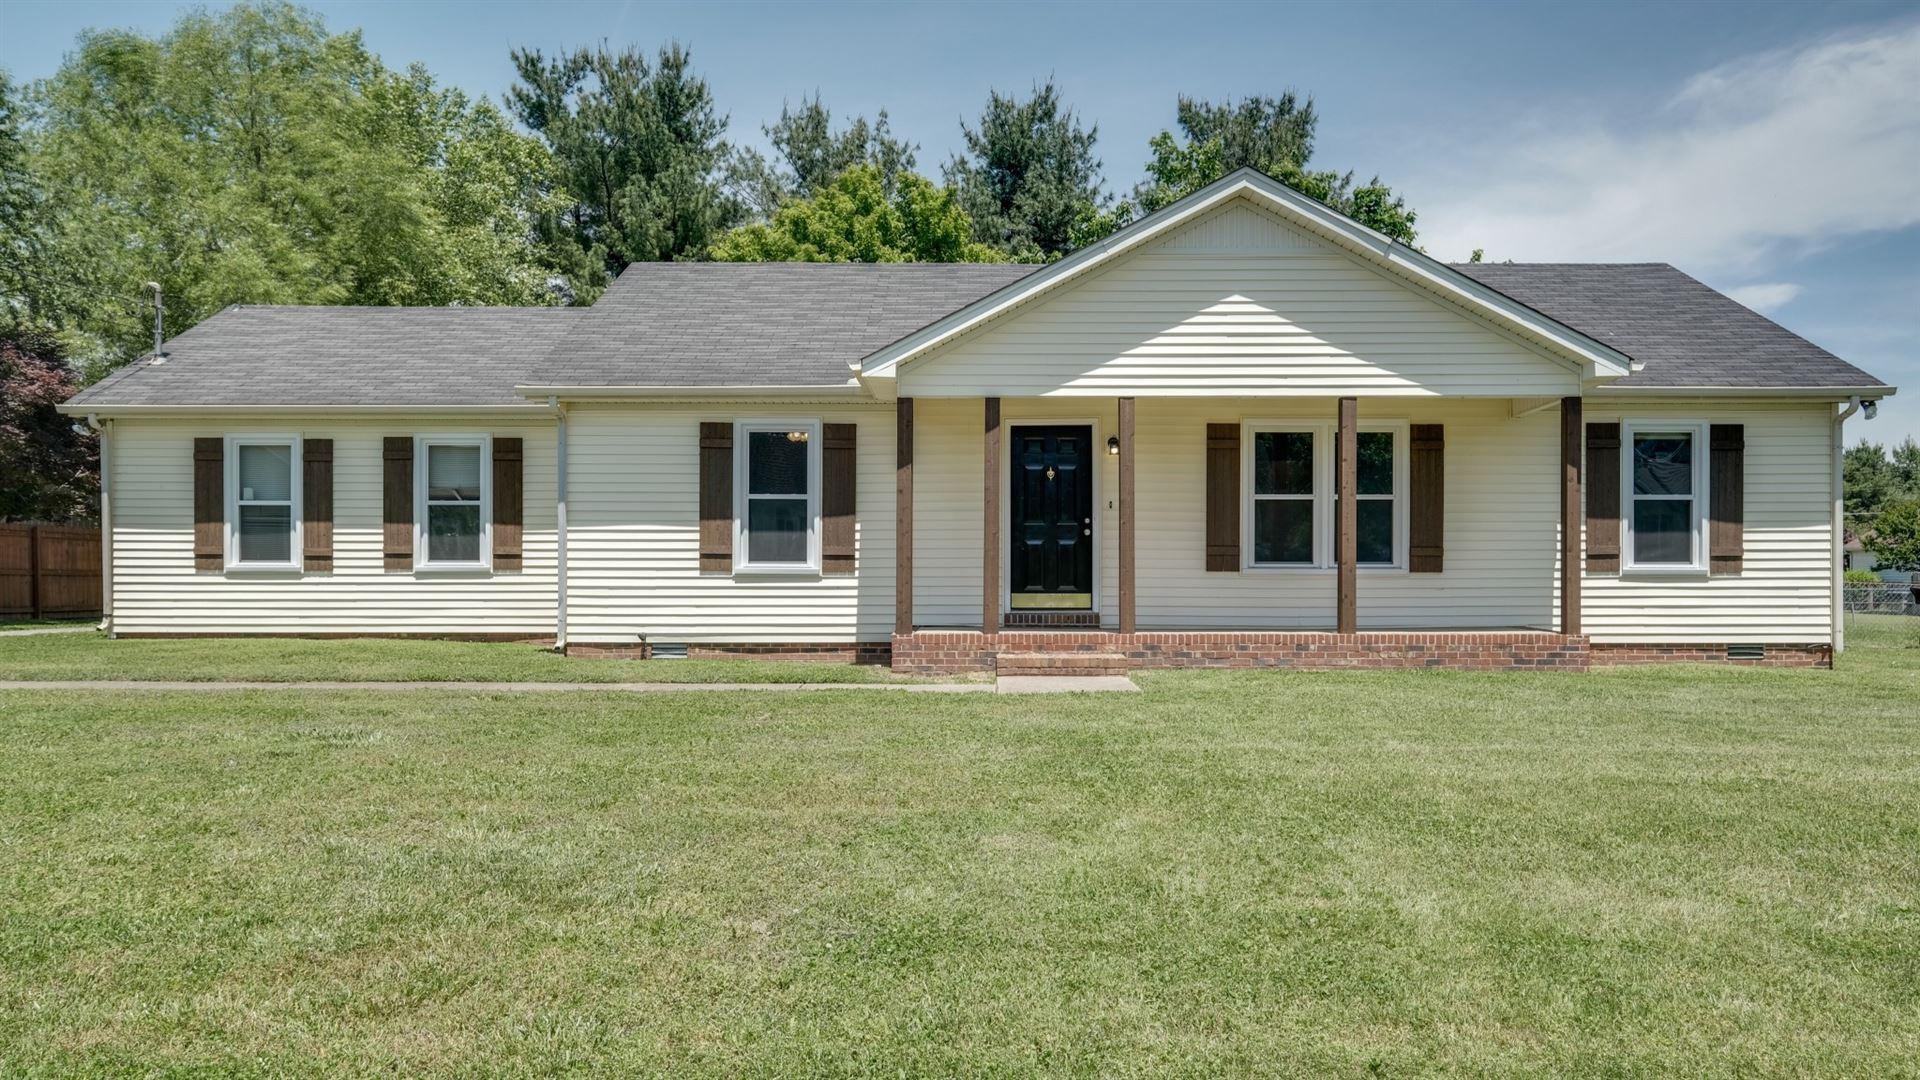 2310 Centertree Dr, Murfreesboro, TN 37128 - MLS#: 2254417